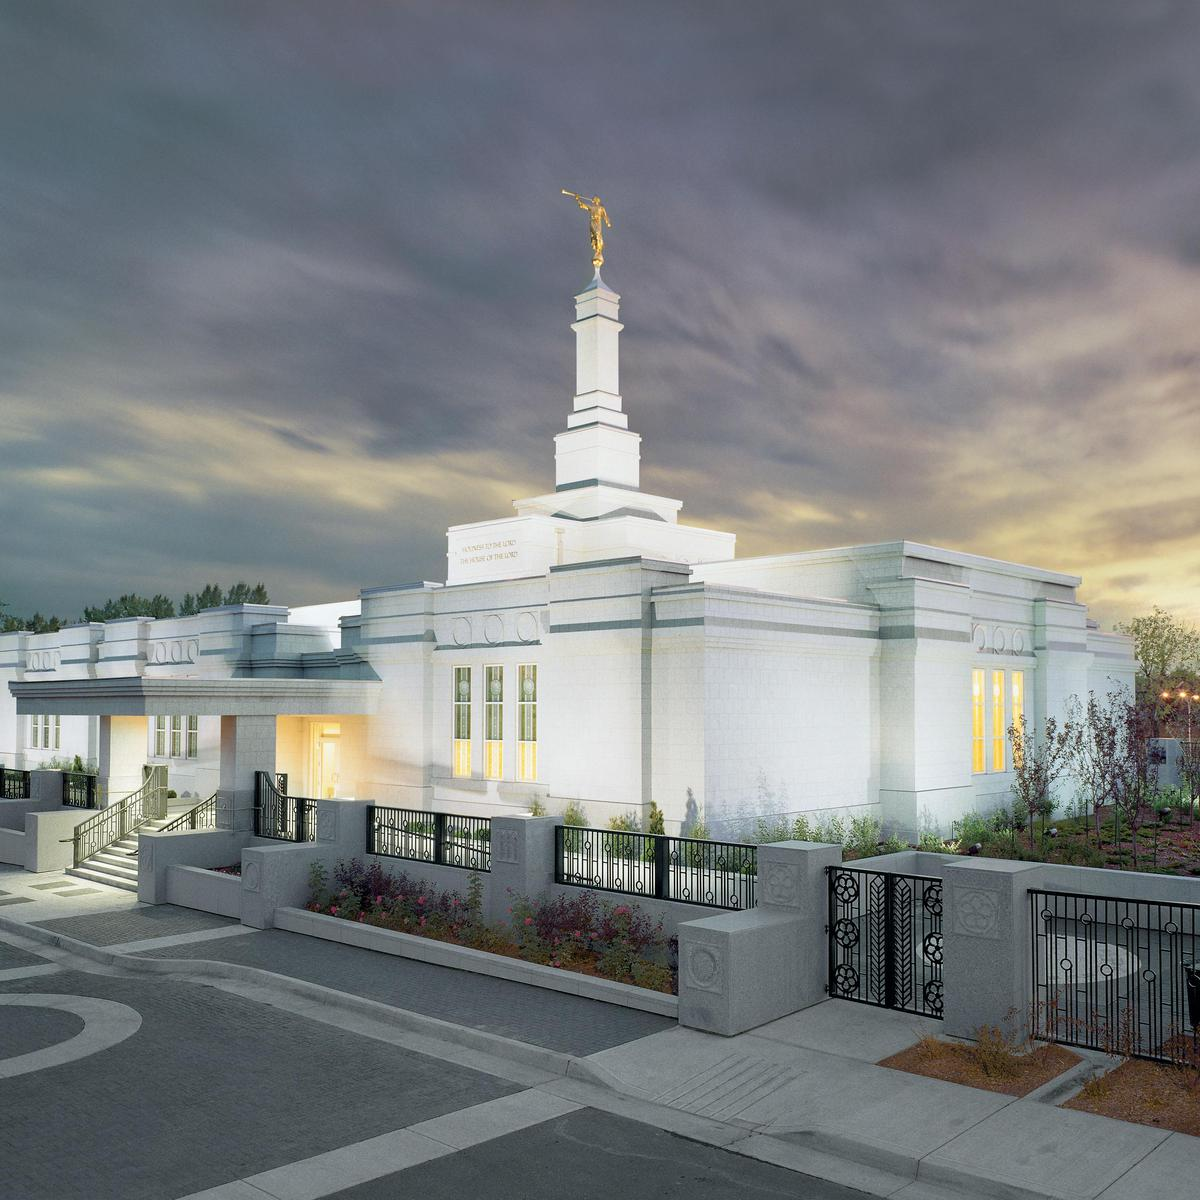 Image of the Edmonton Alberta Mormon Temple in Canada